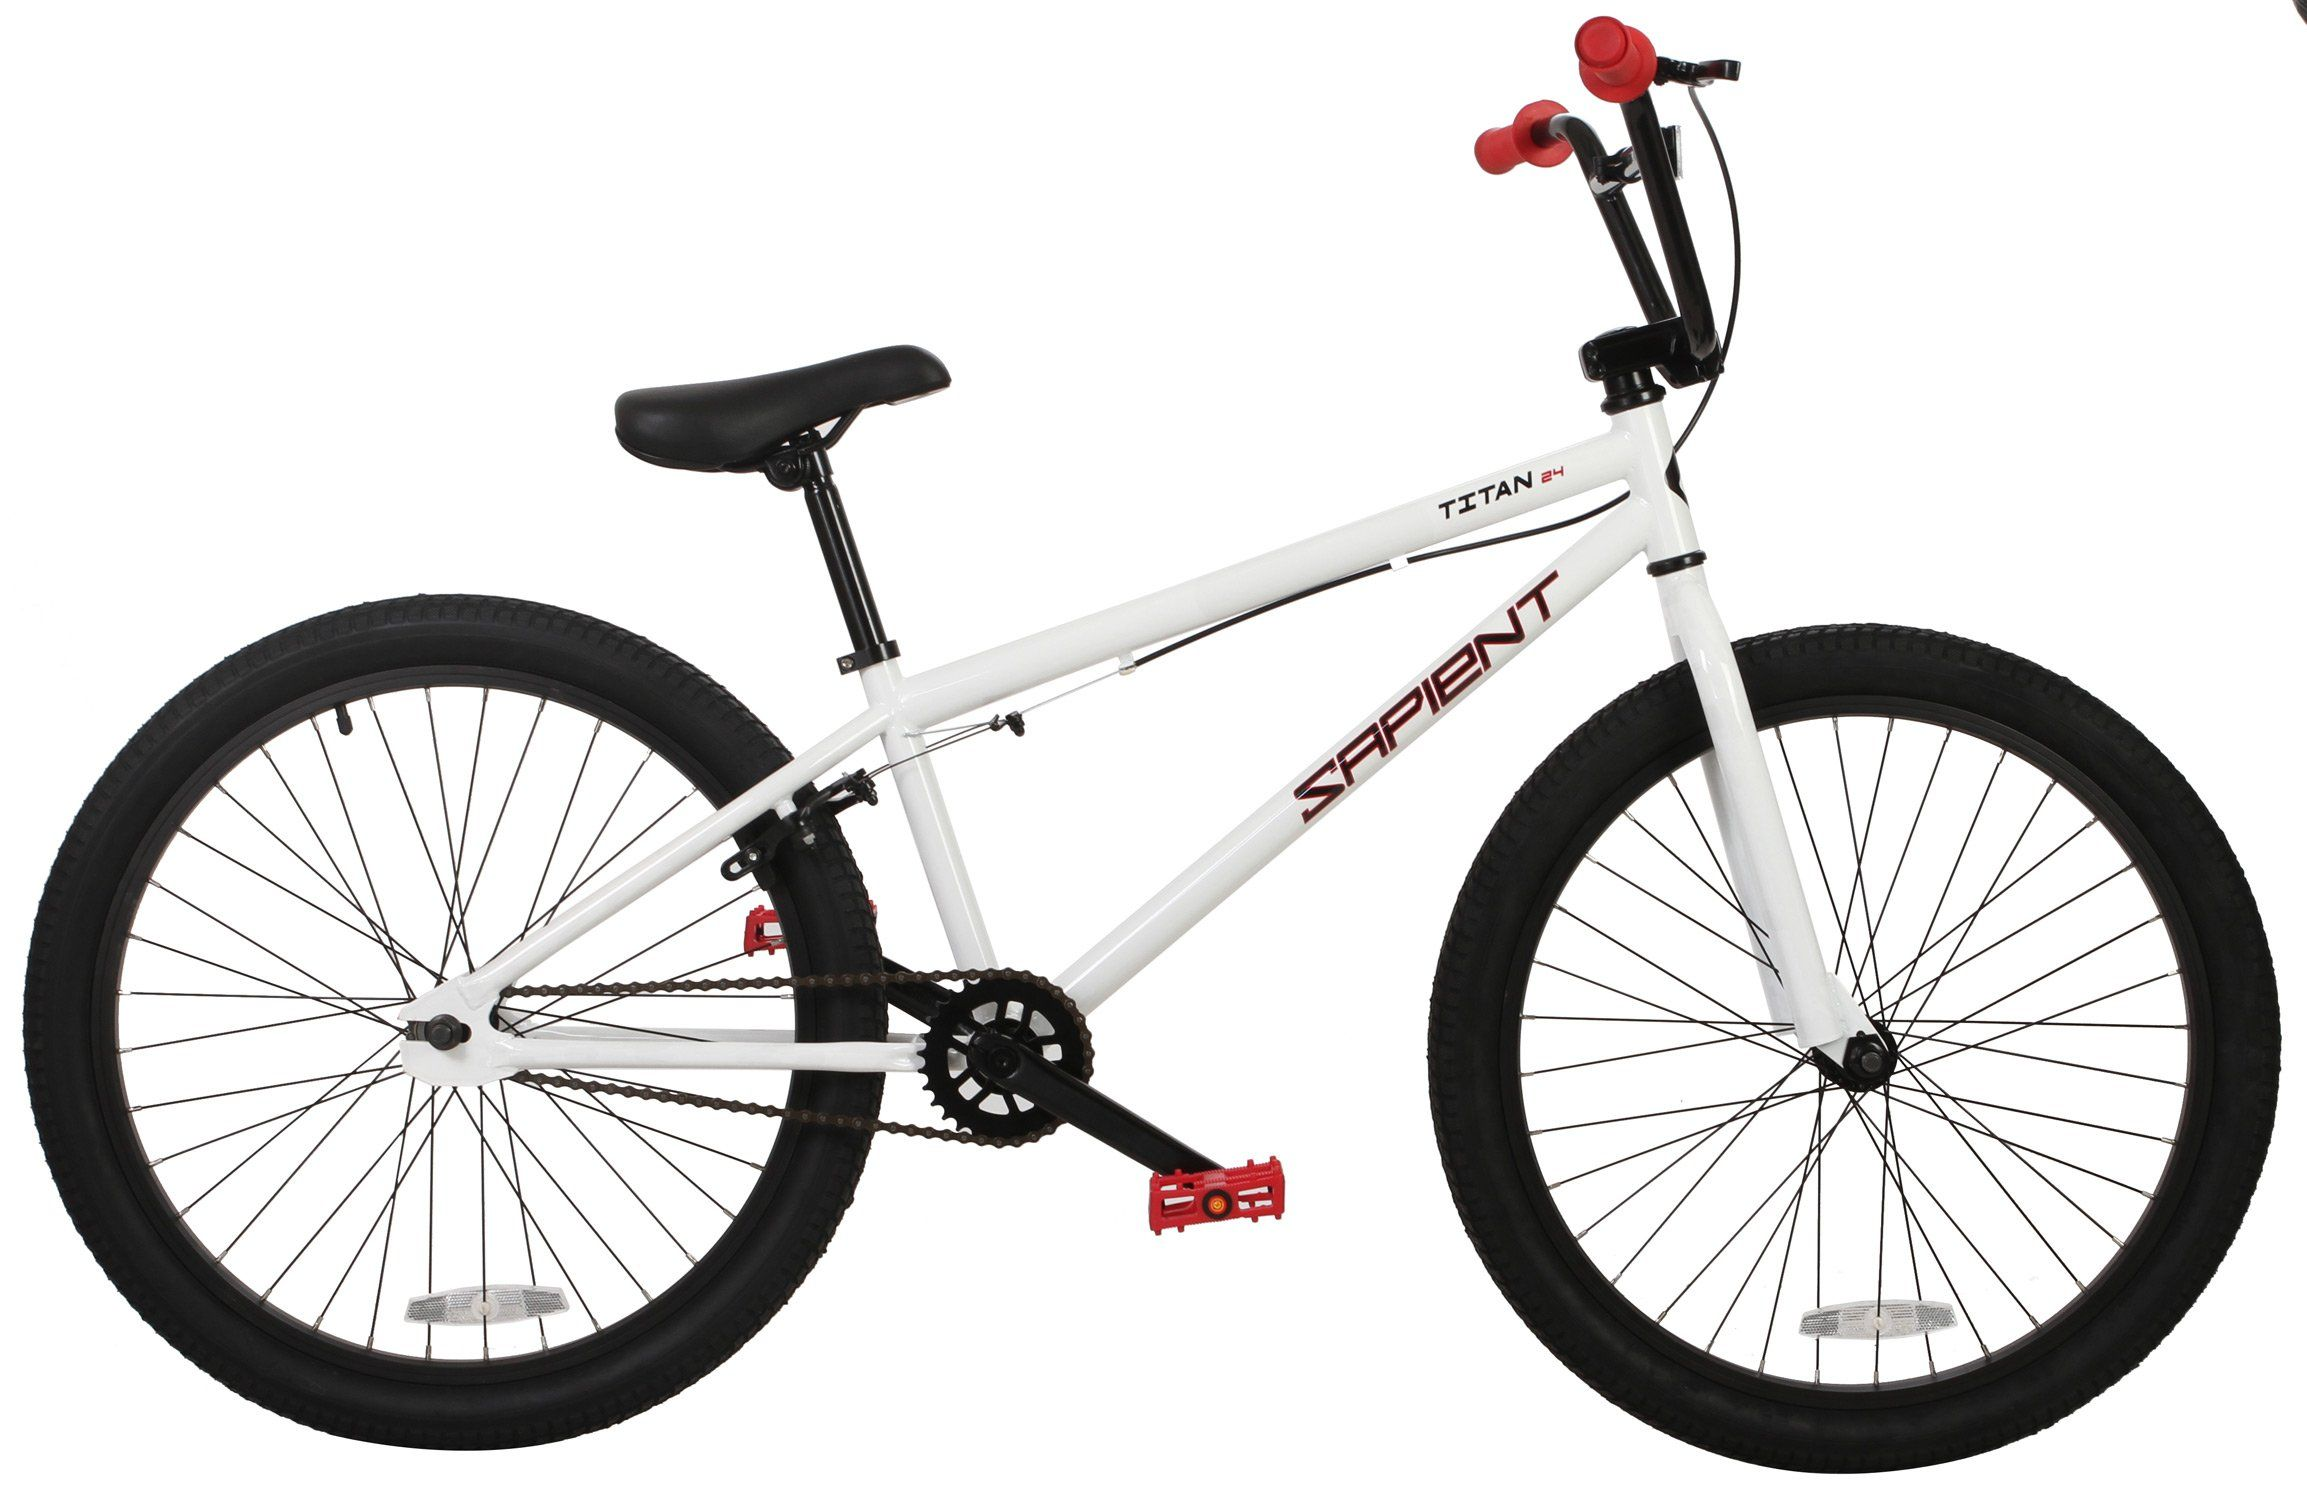 Sapient Titan BMX Bike Sz 24in/22.7in Top Tube. FRAME: HiTen 22.7